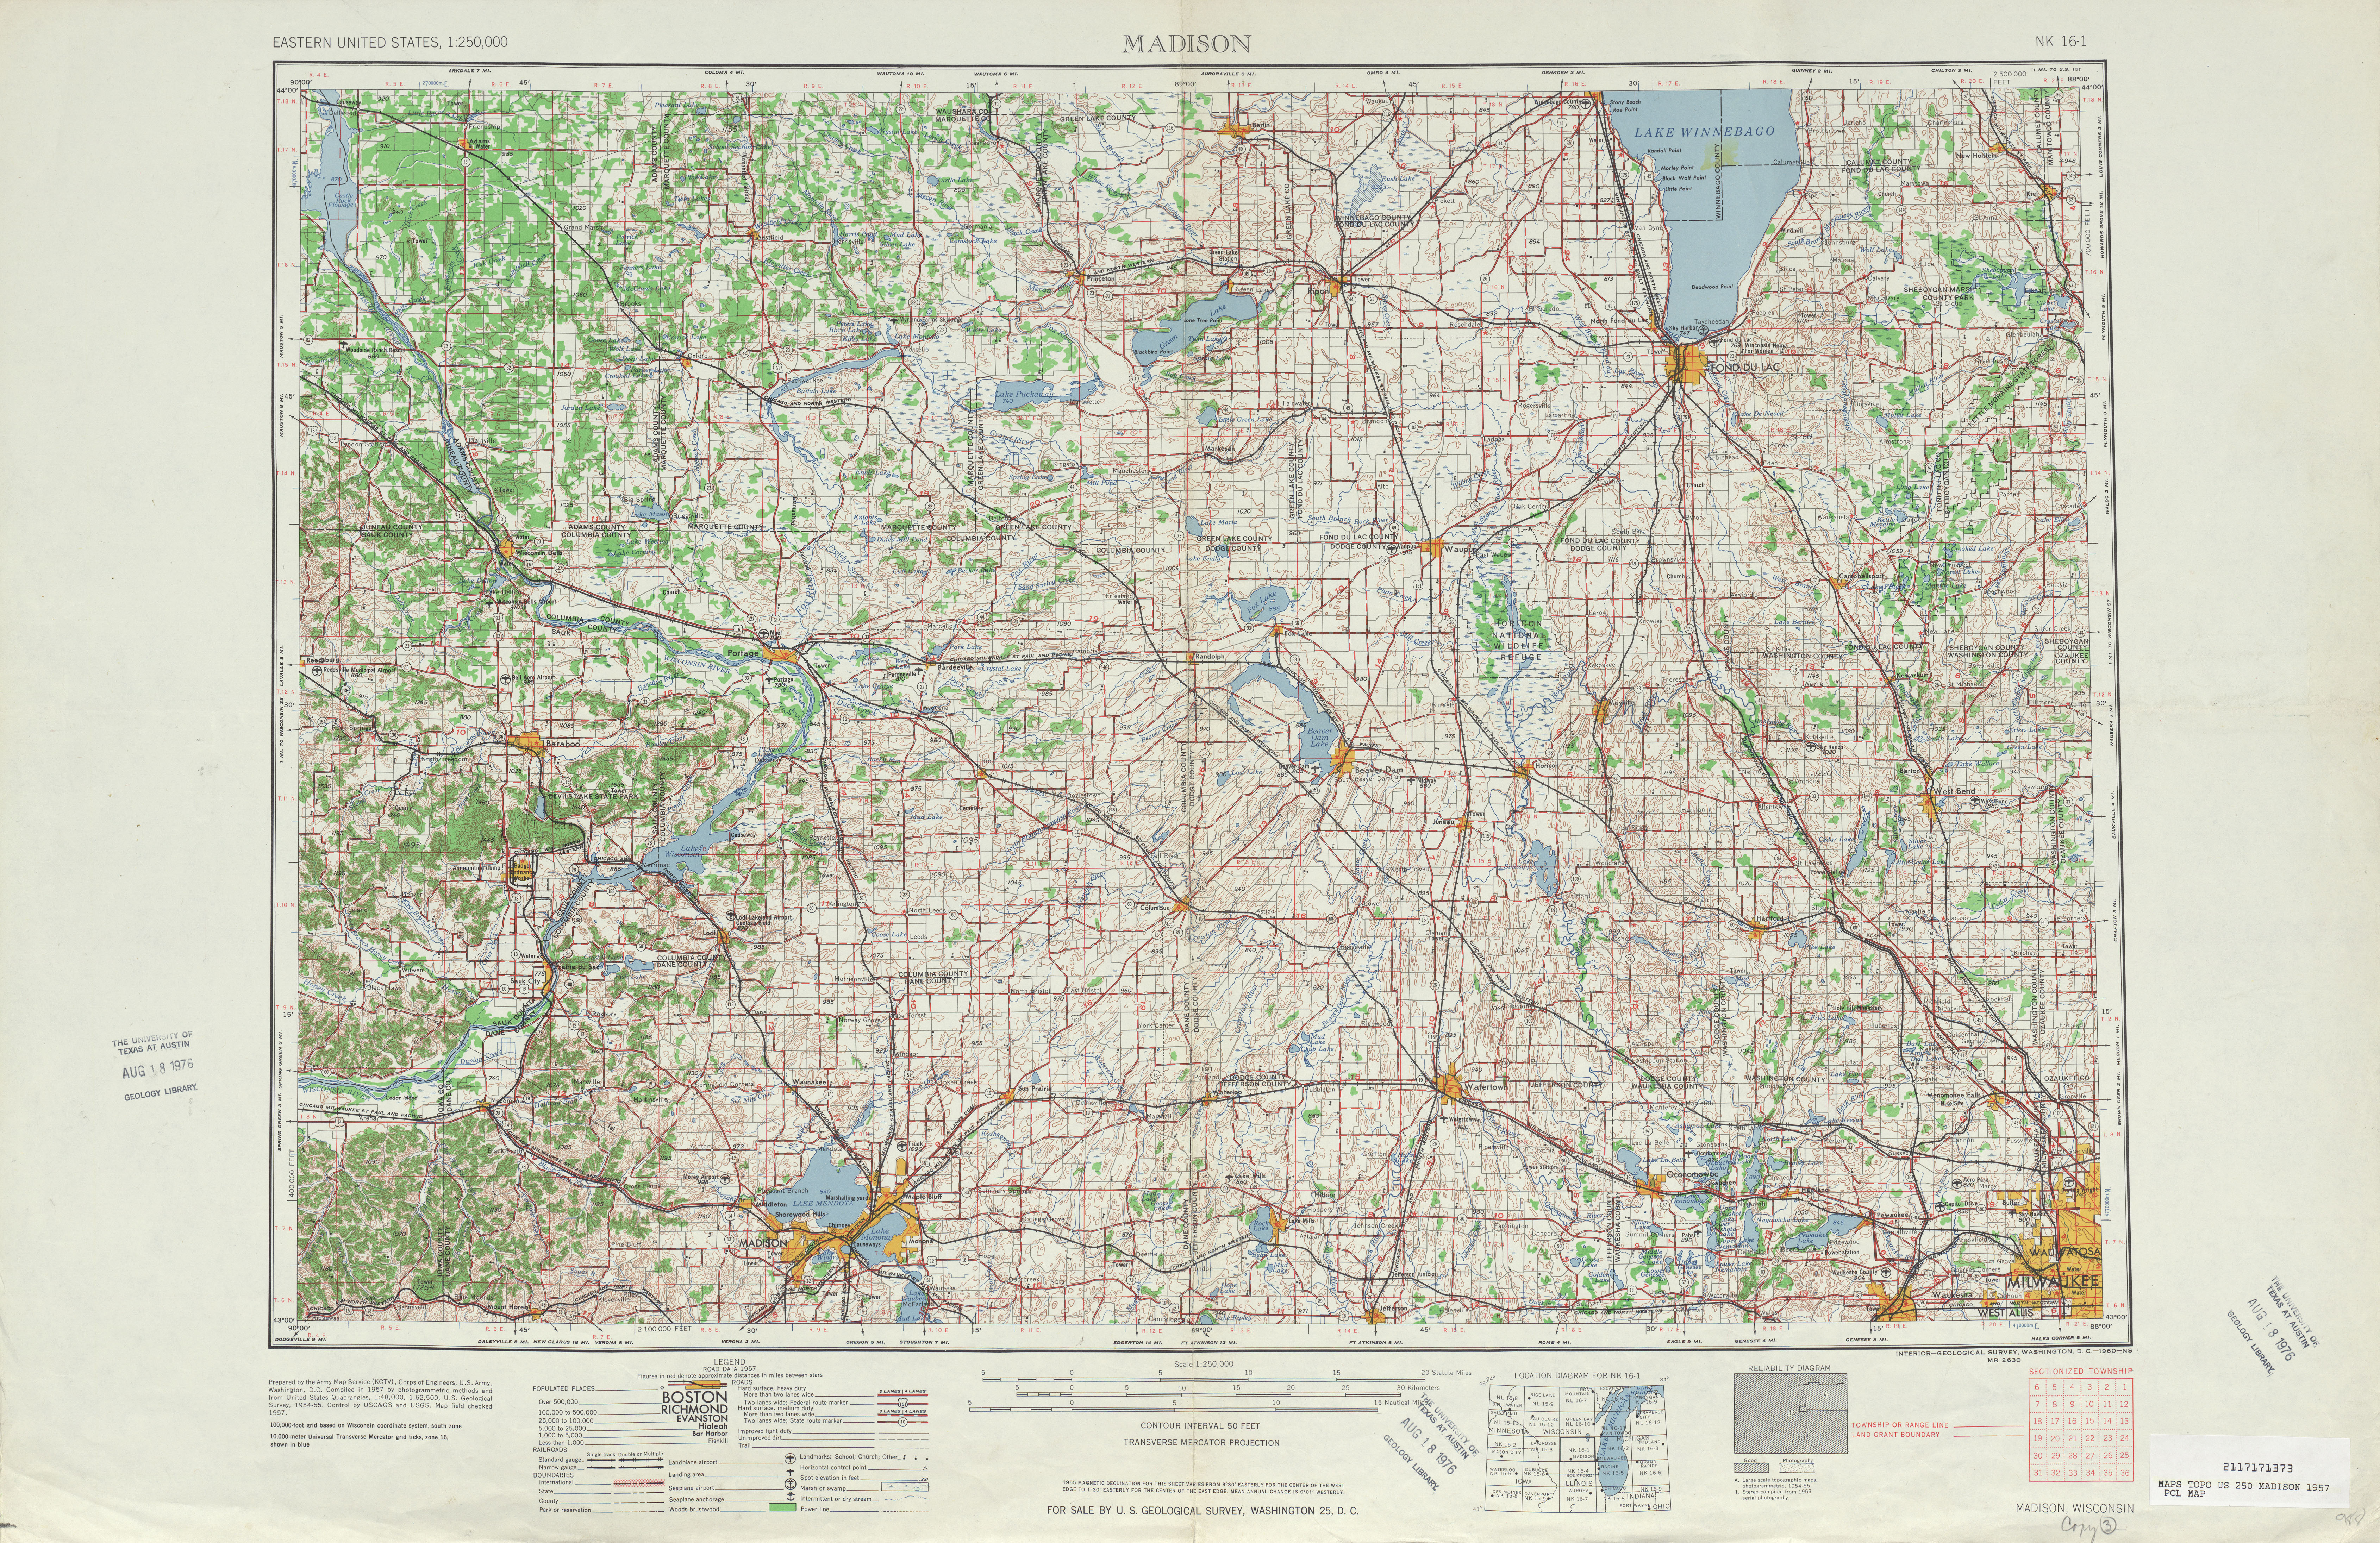 Madison Topographic Map Sheet, United States 1957